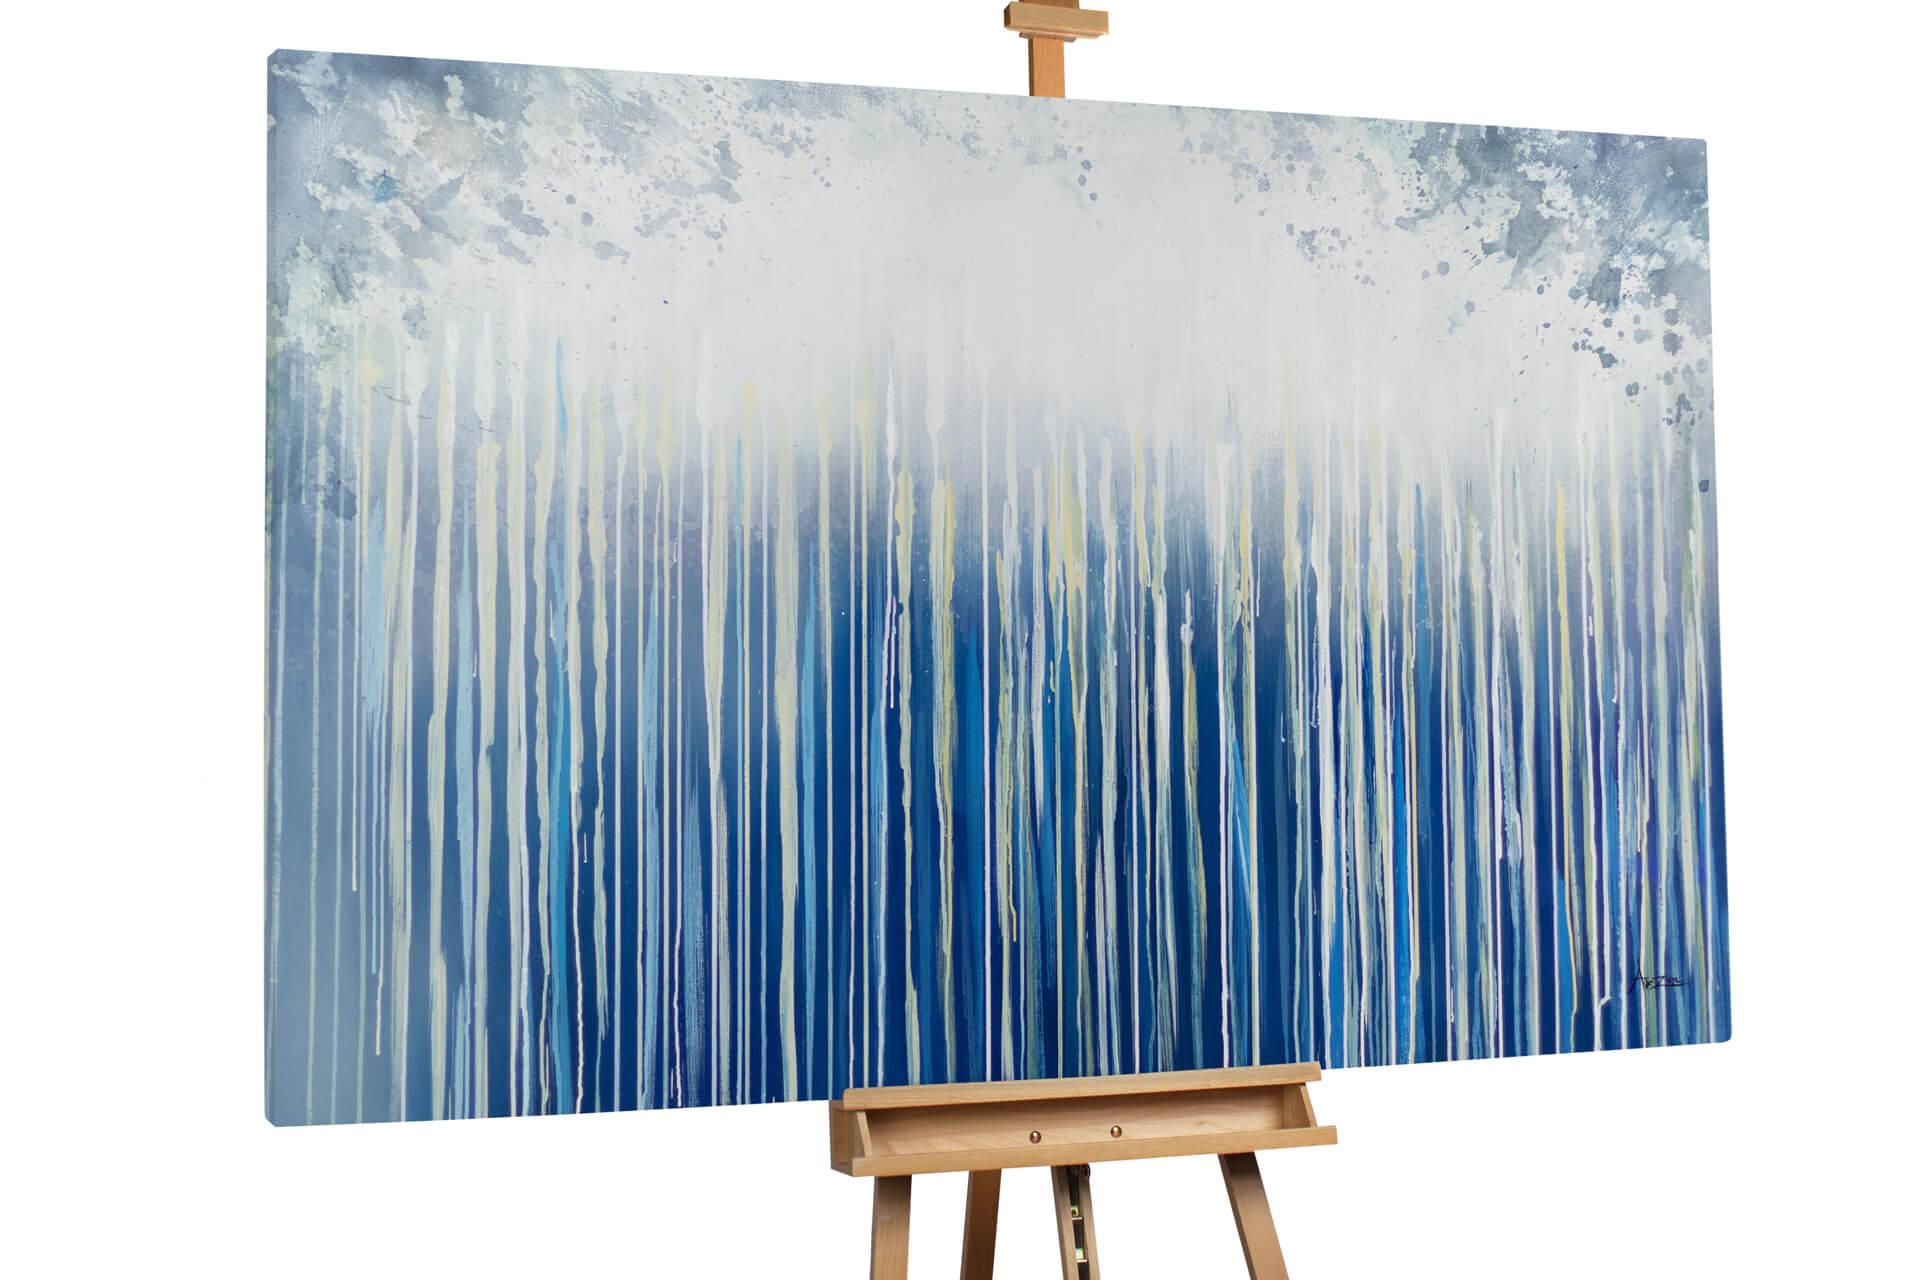 kl abstrakt regen grau blau oel gemaelde oel bilder handgemalte unikate moderne kunst 1 01